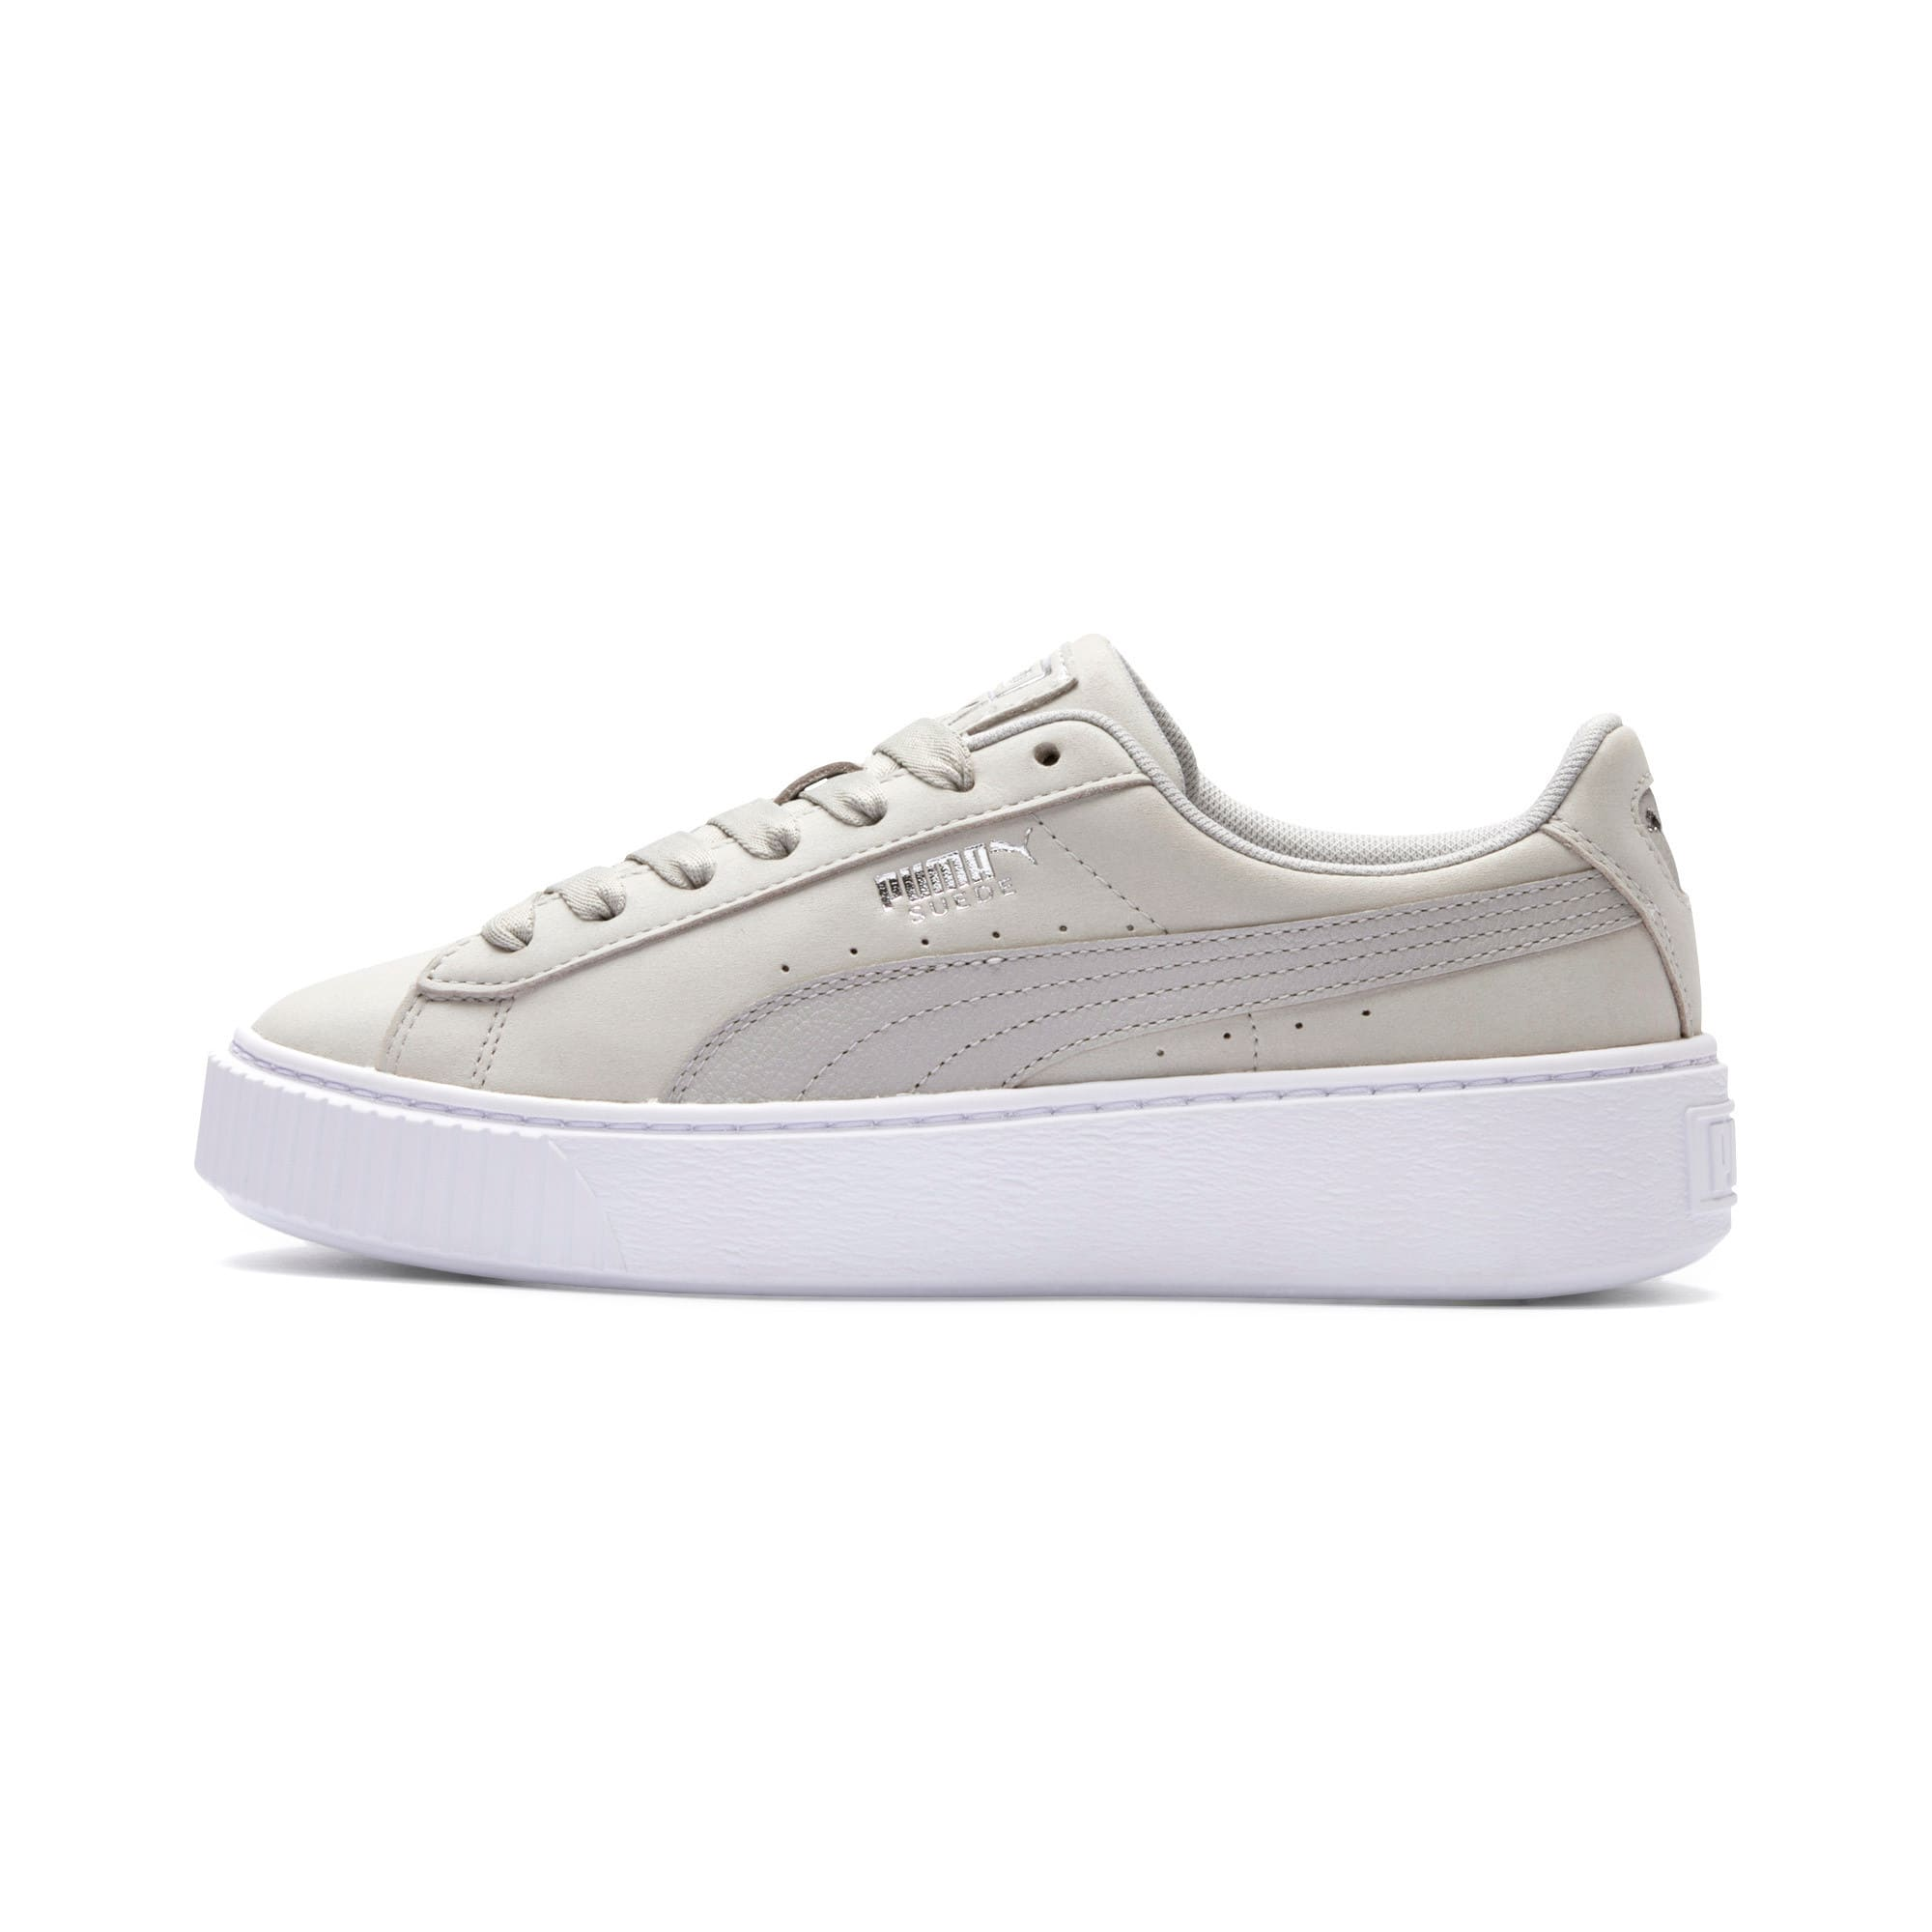 Thumbnail 1 of Suede Platform Shimmer Women's Sneakers, Gray Violet-Puma White, medium